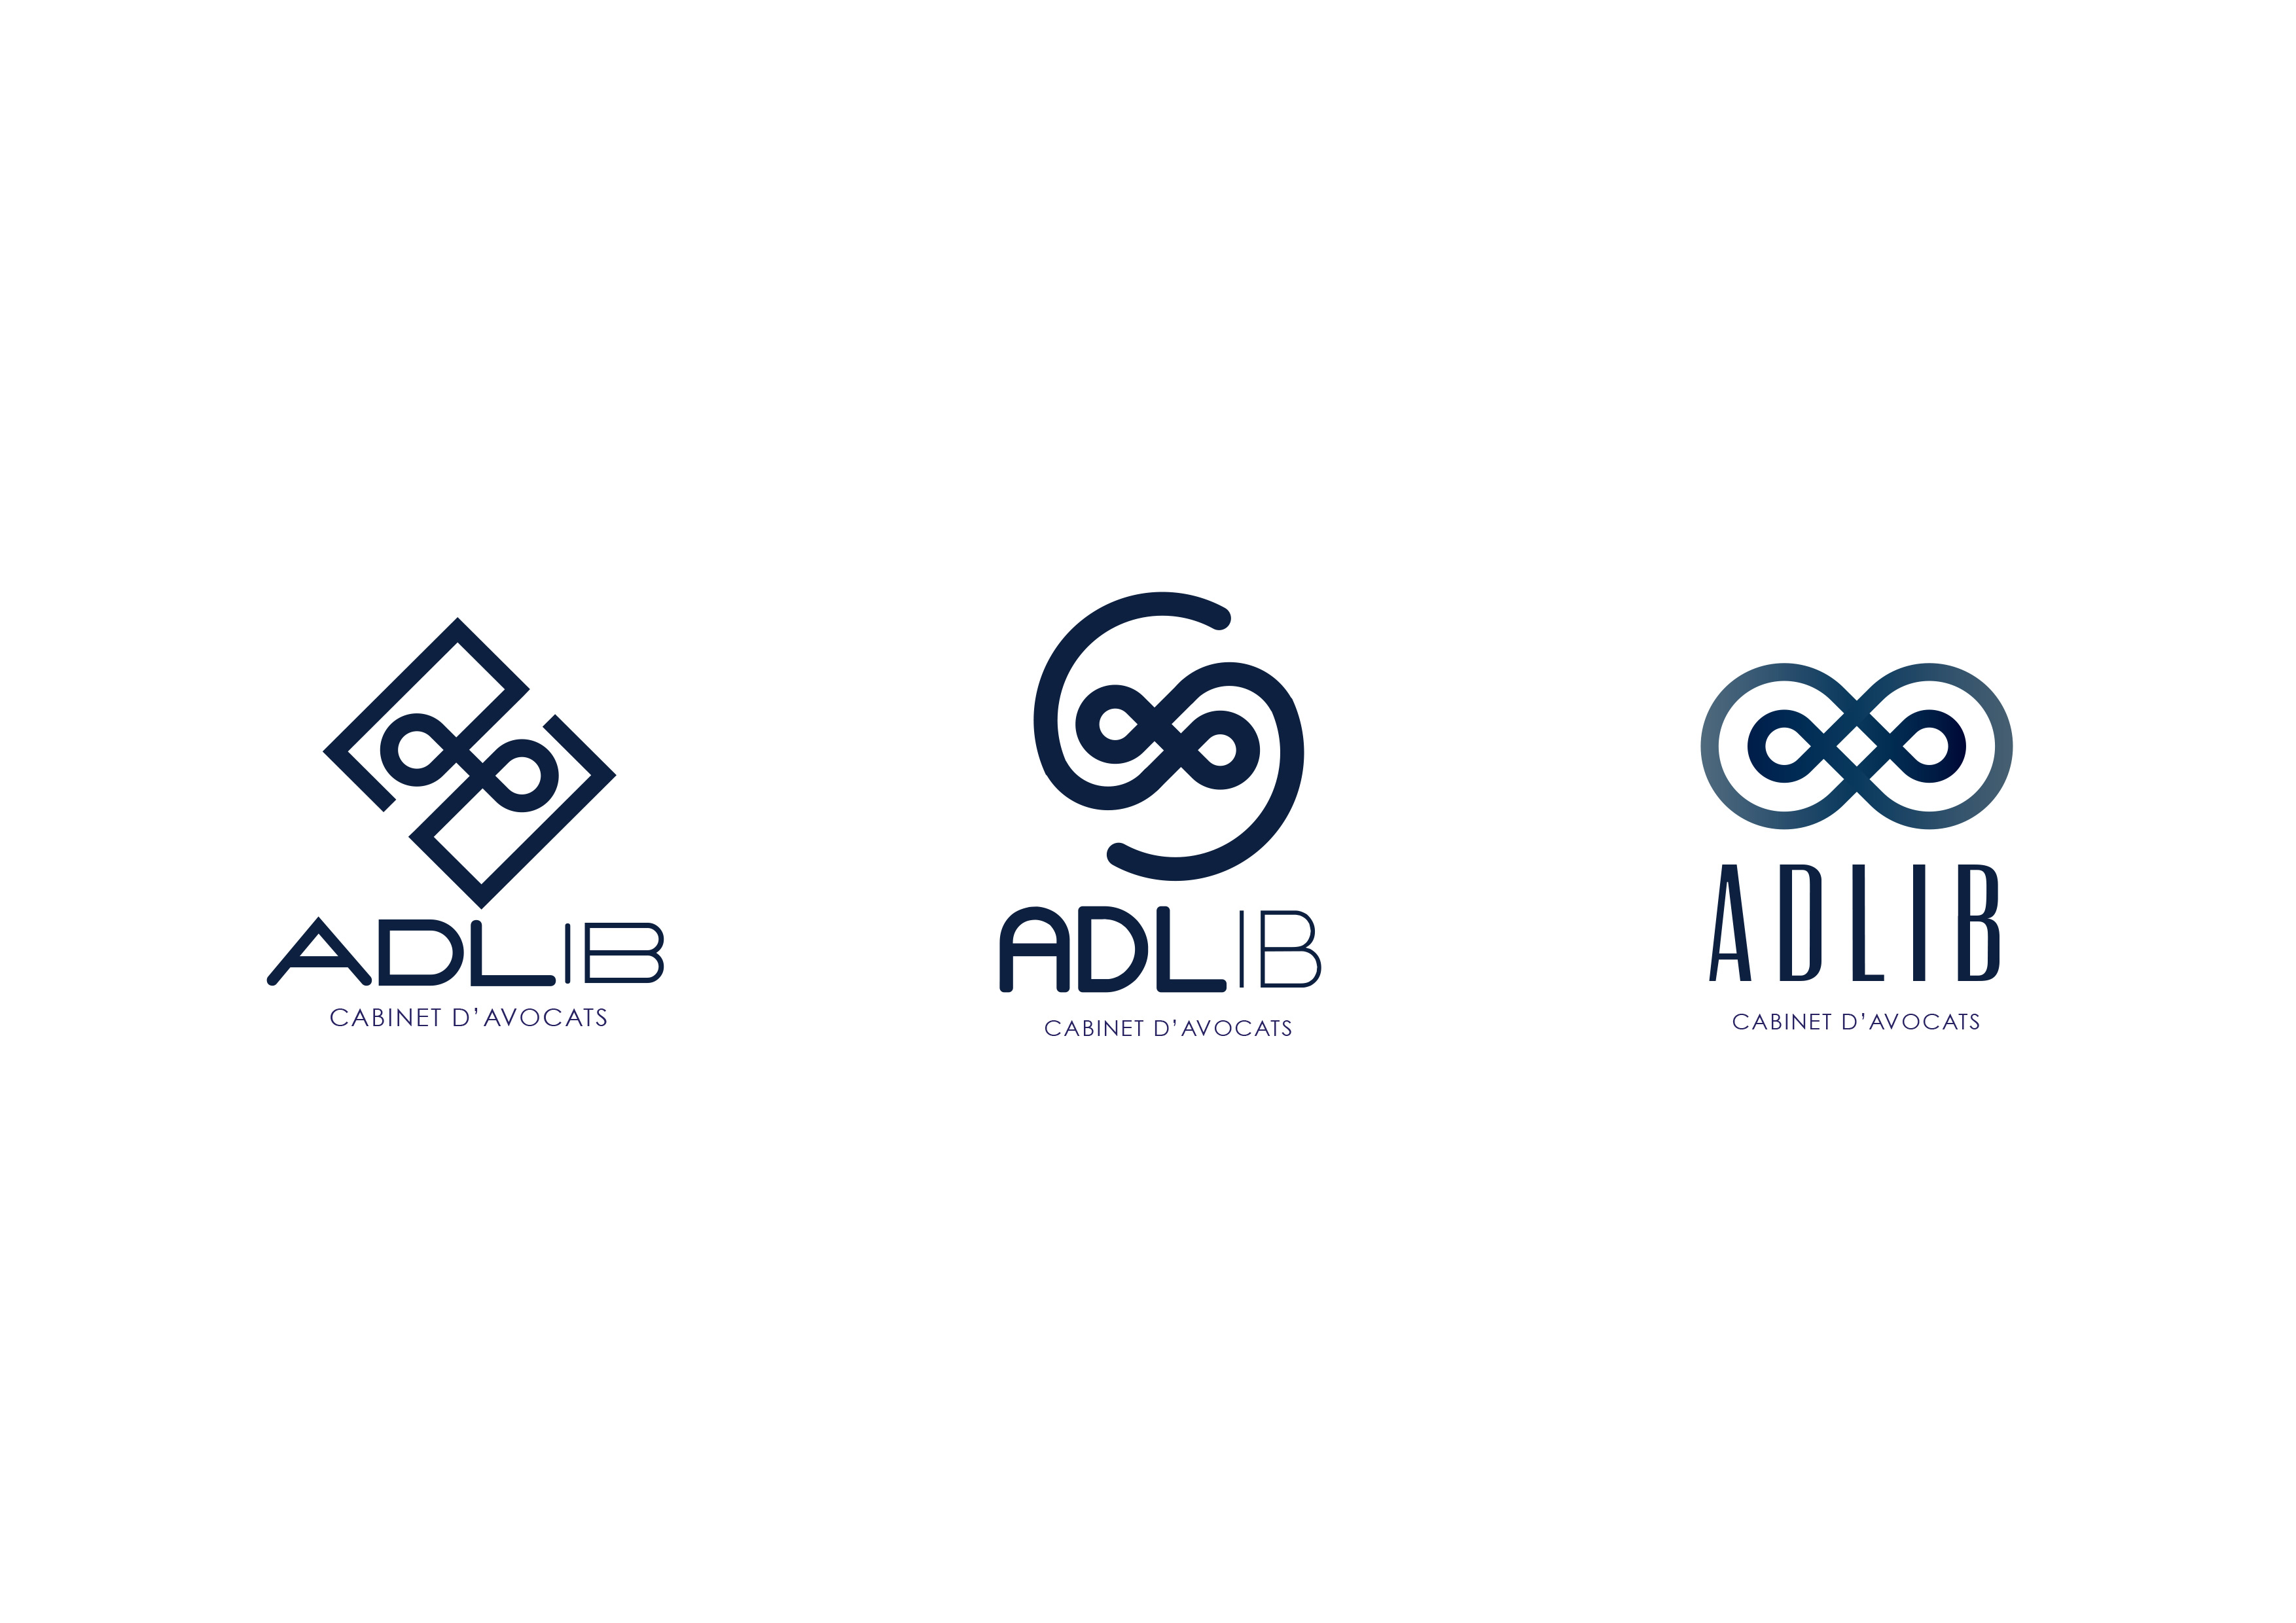 Csakébon - Cabinet d'avocat ADLIB - All rights reserved